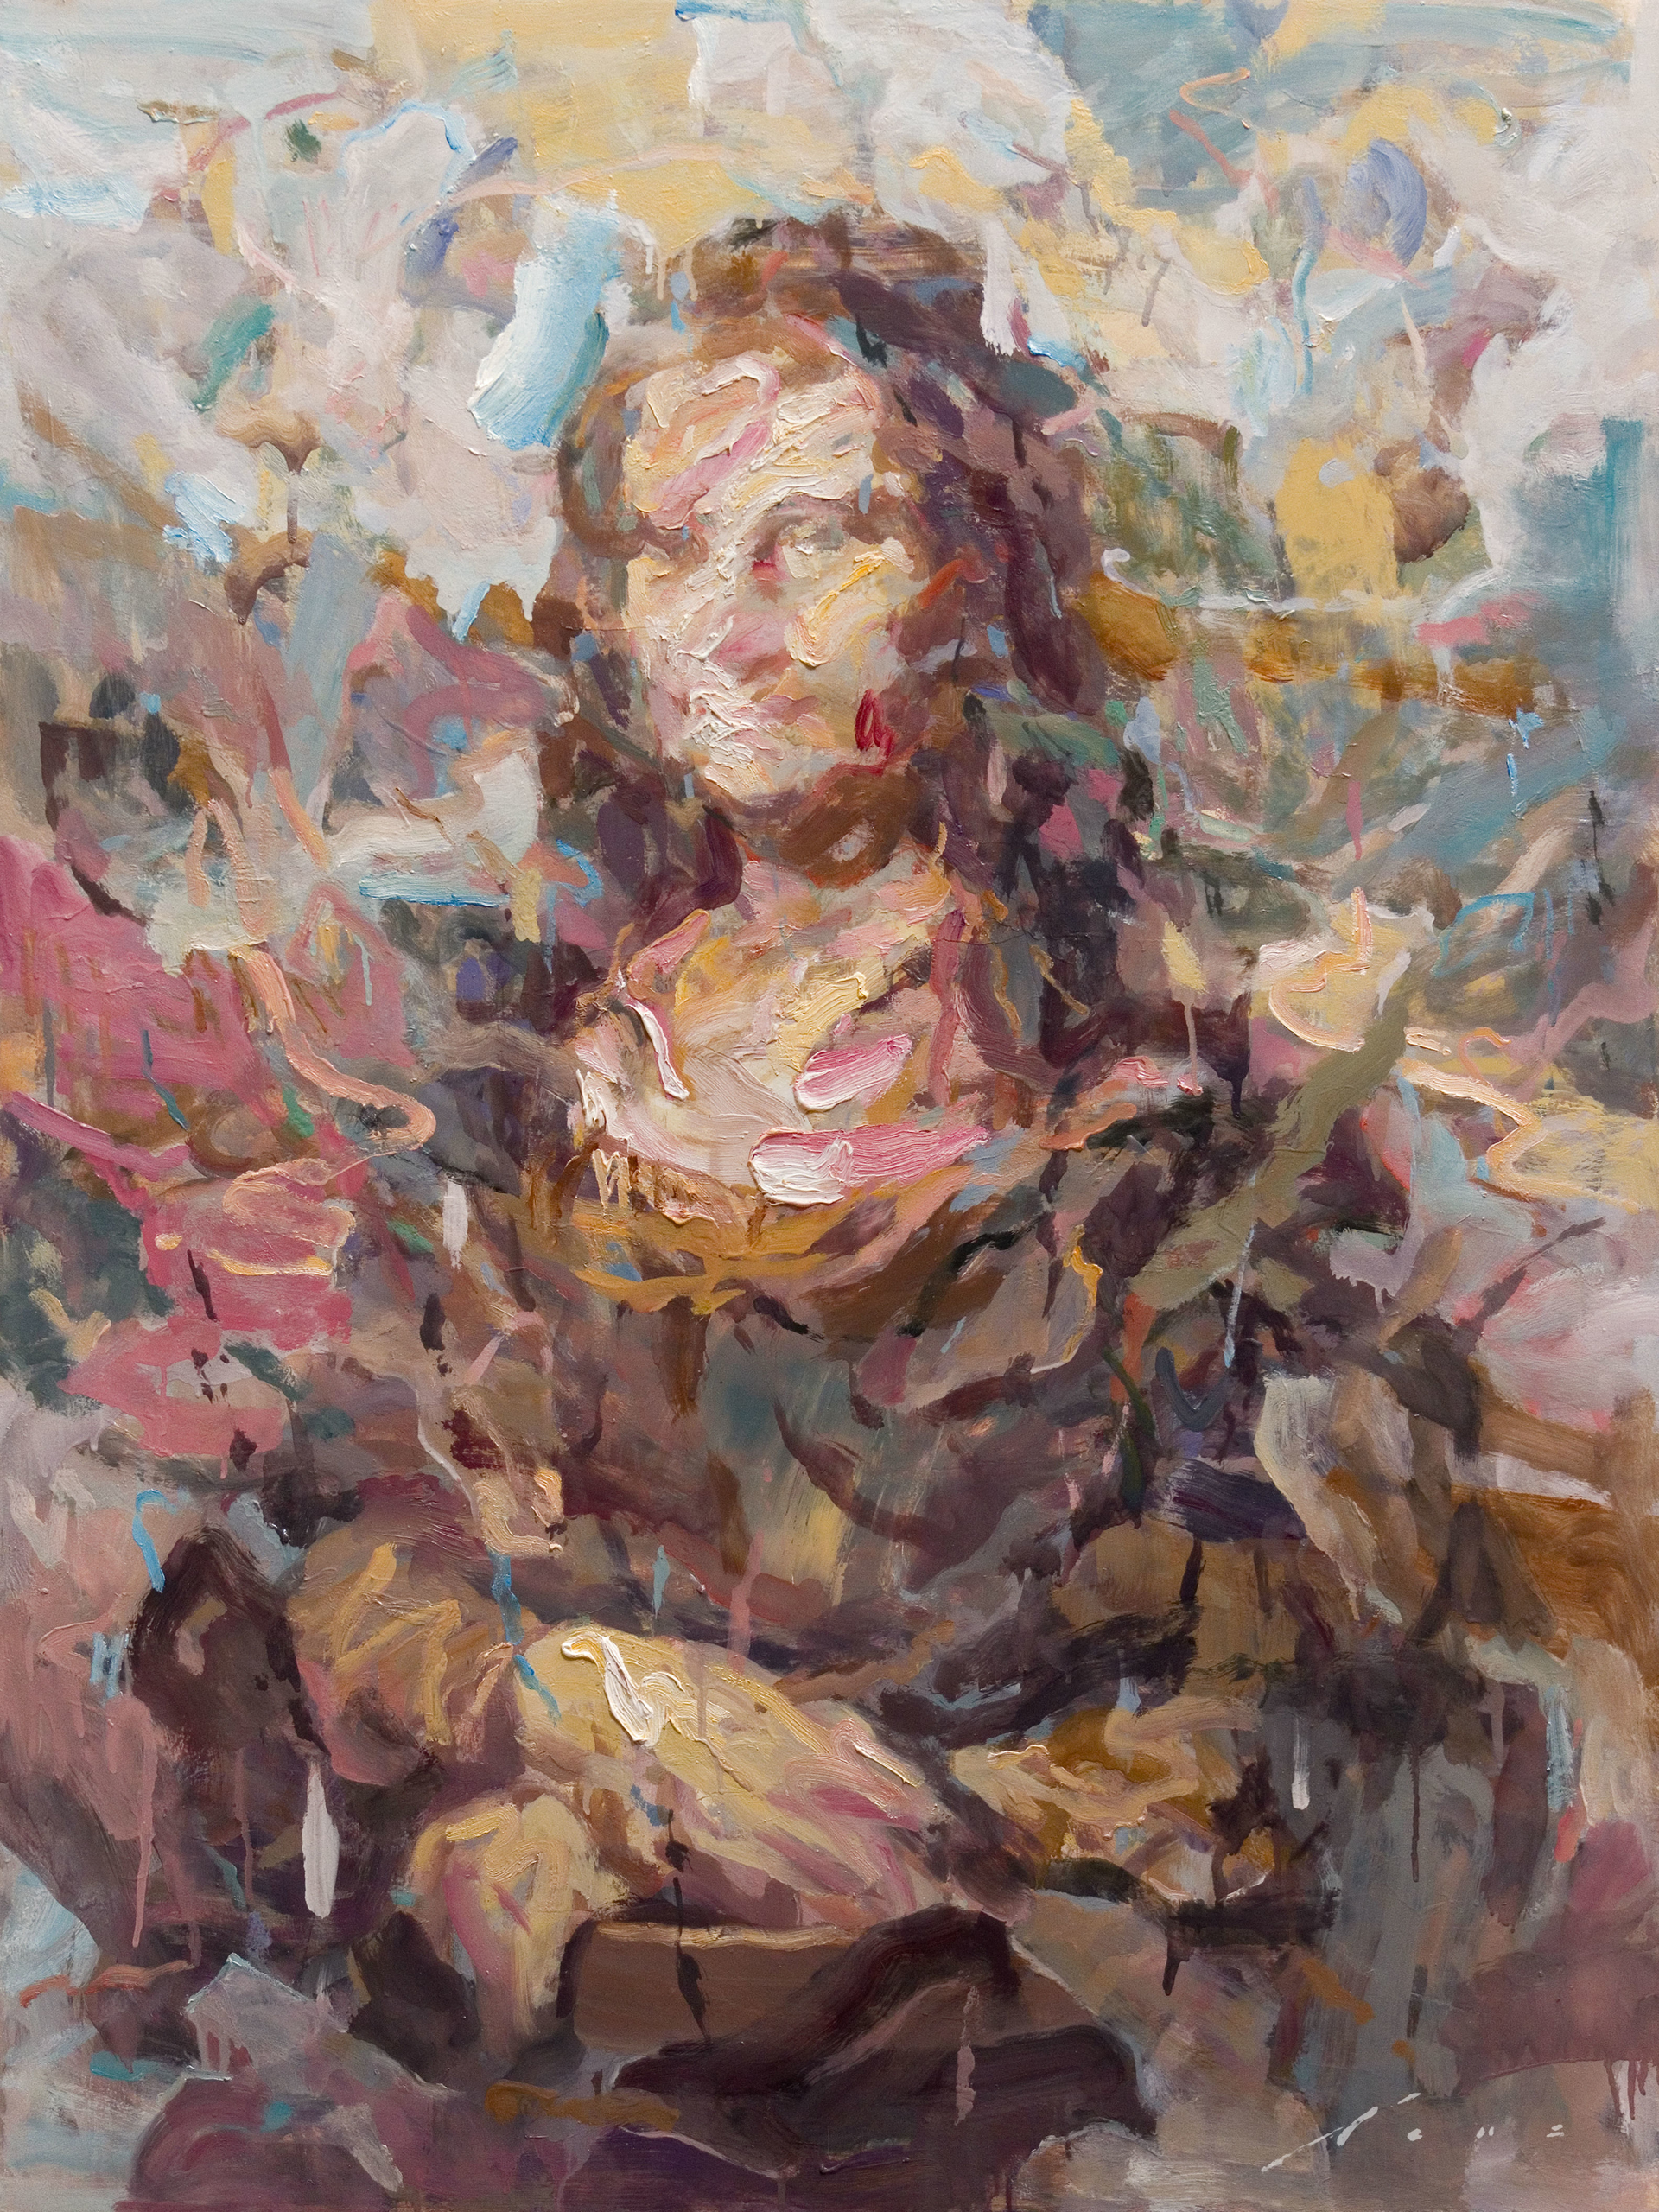 Mona 1 by Vincent Xeus